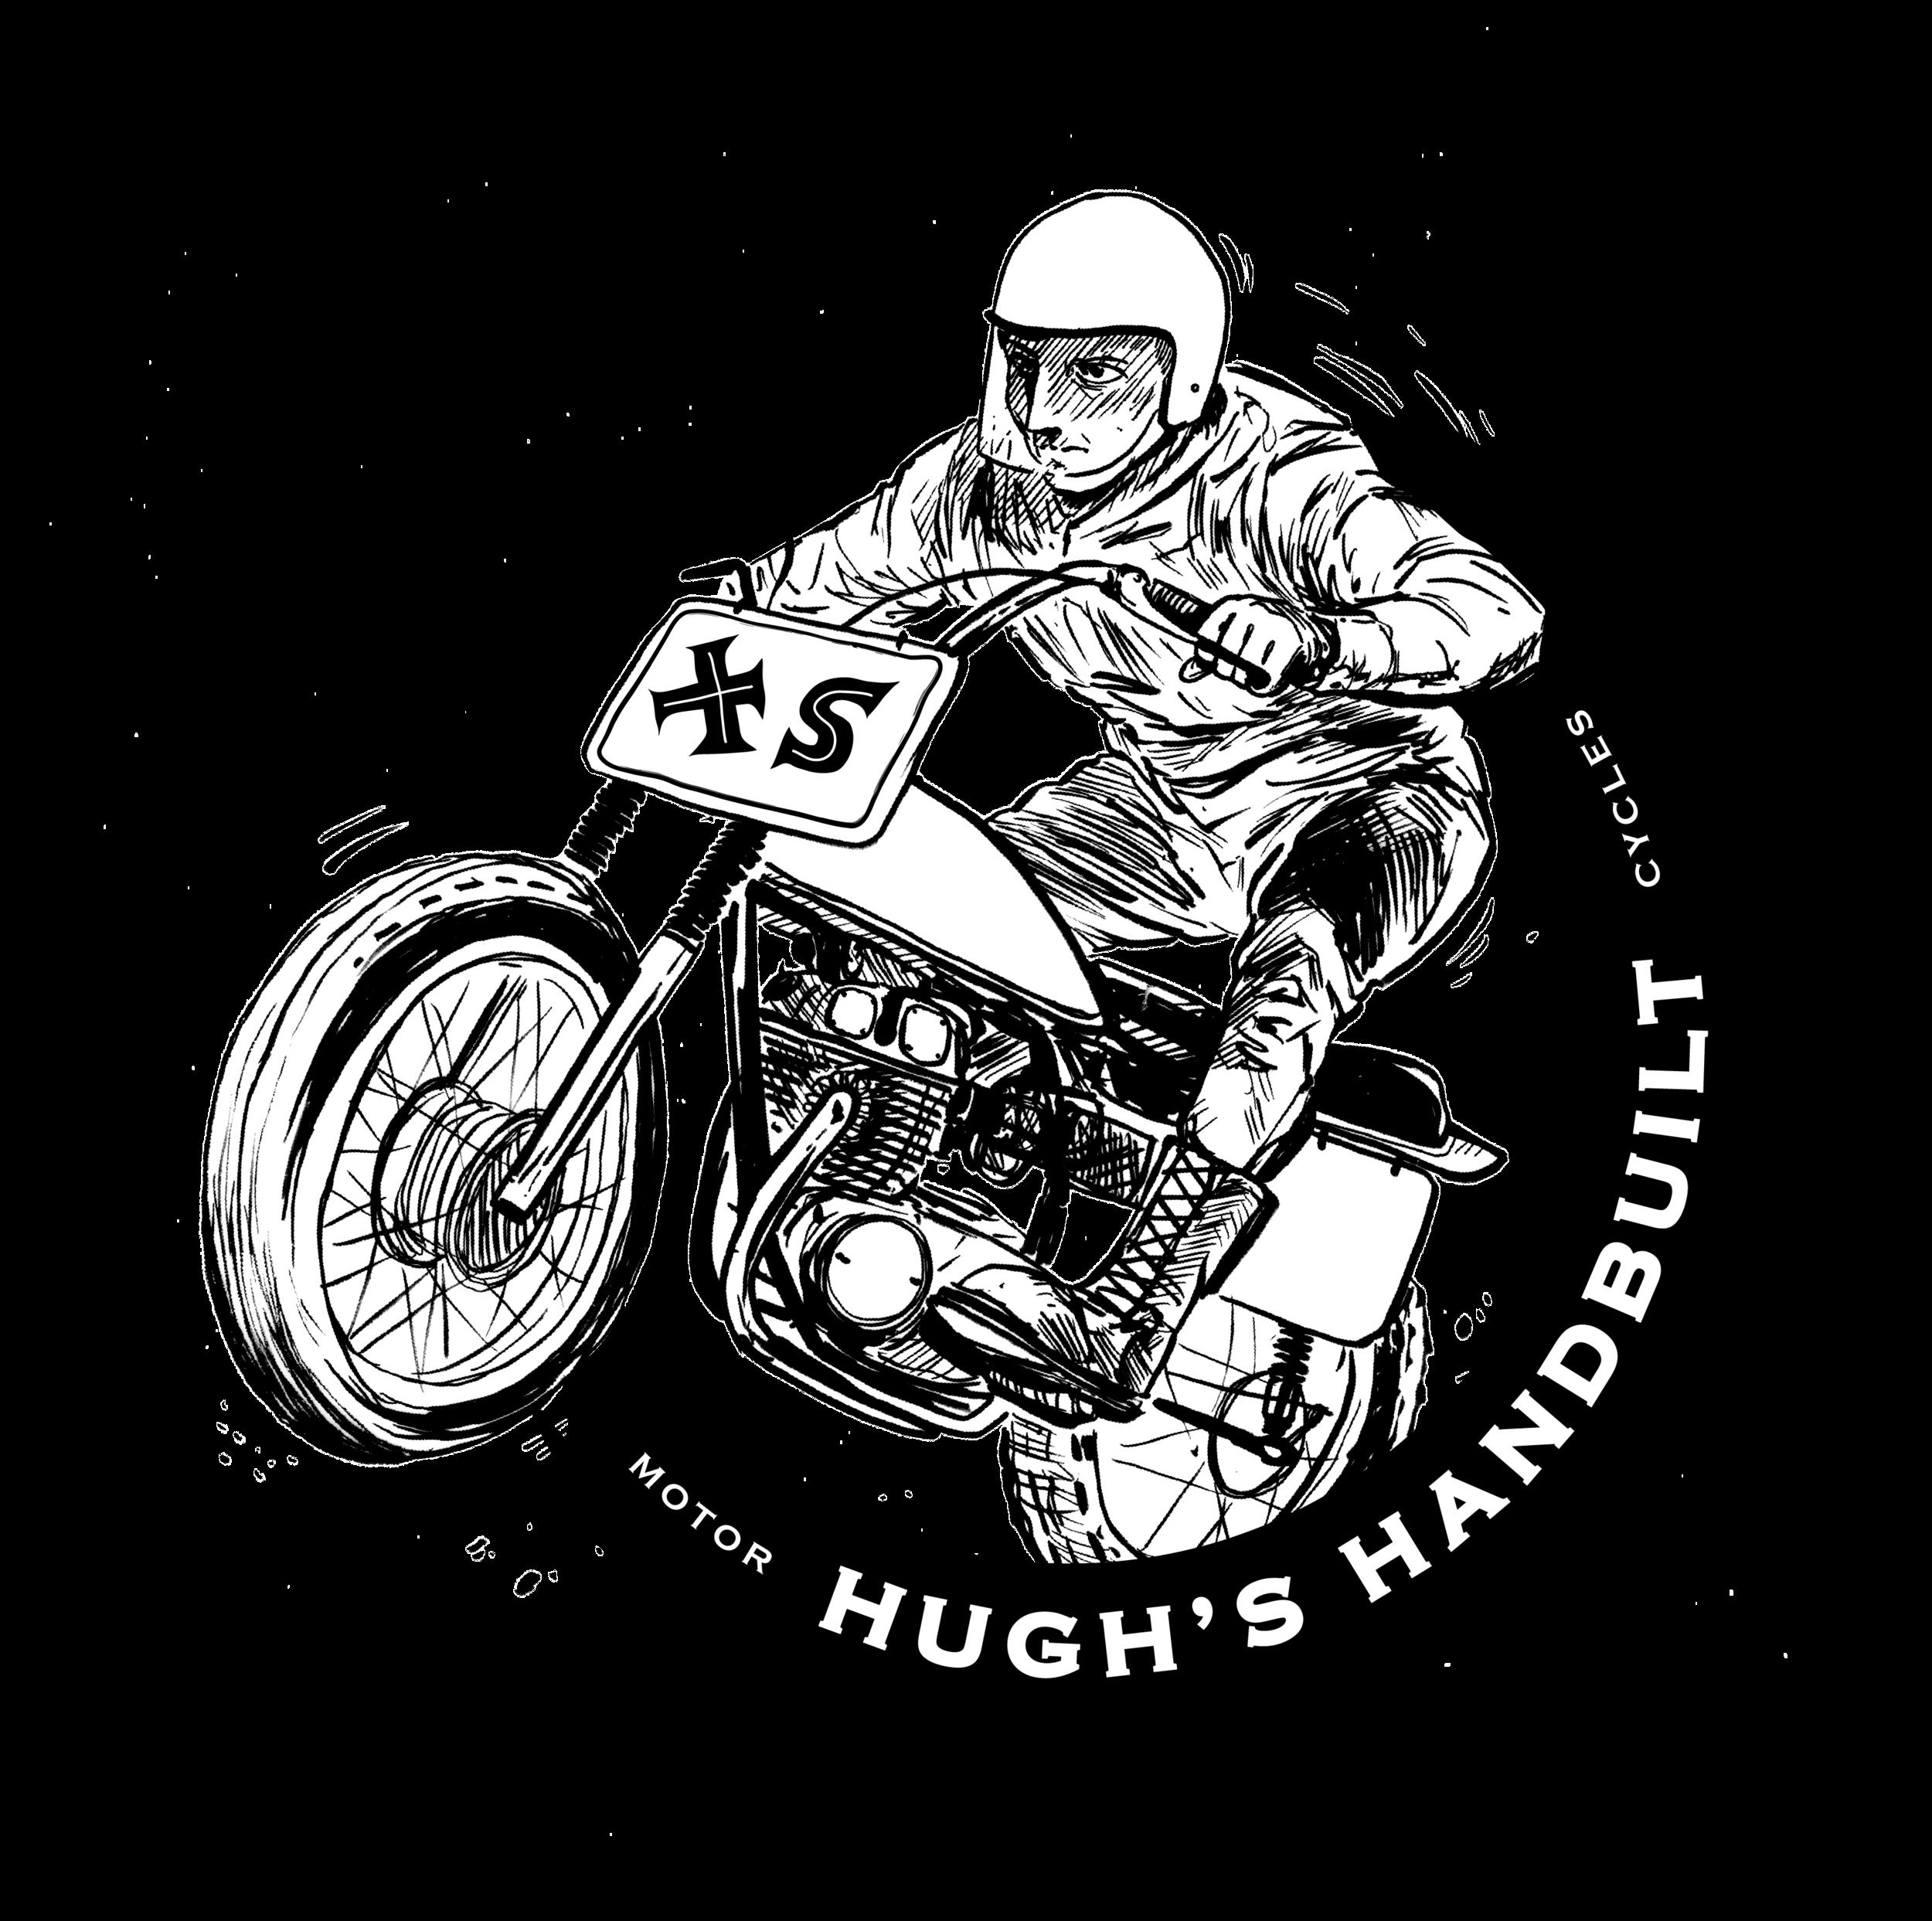 HUgh's Handbuilt SHirt Graphic 02